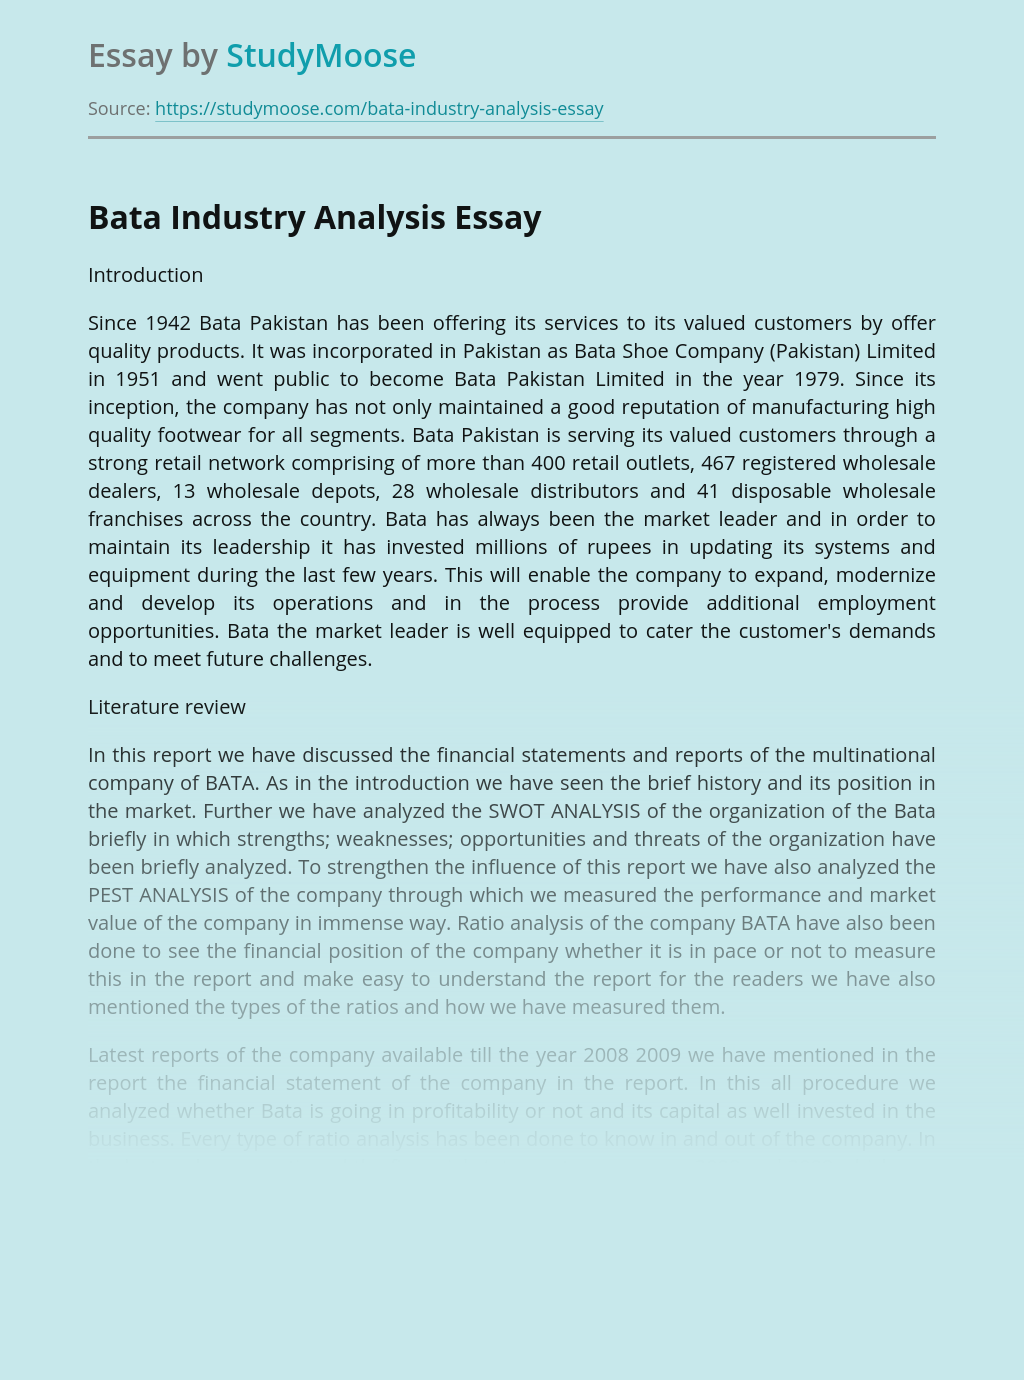 Bata Industry Analysis